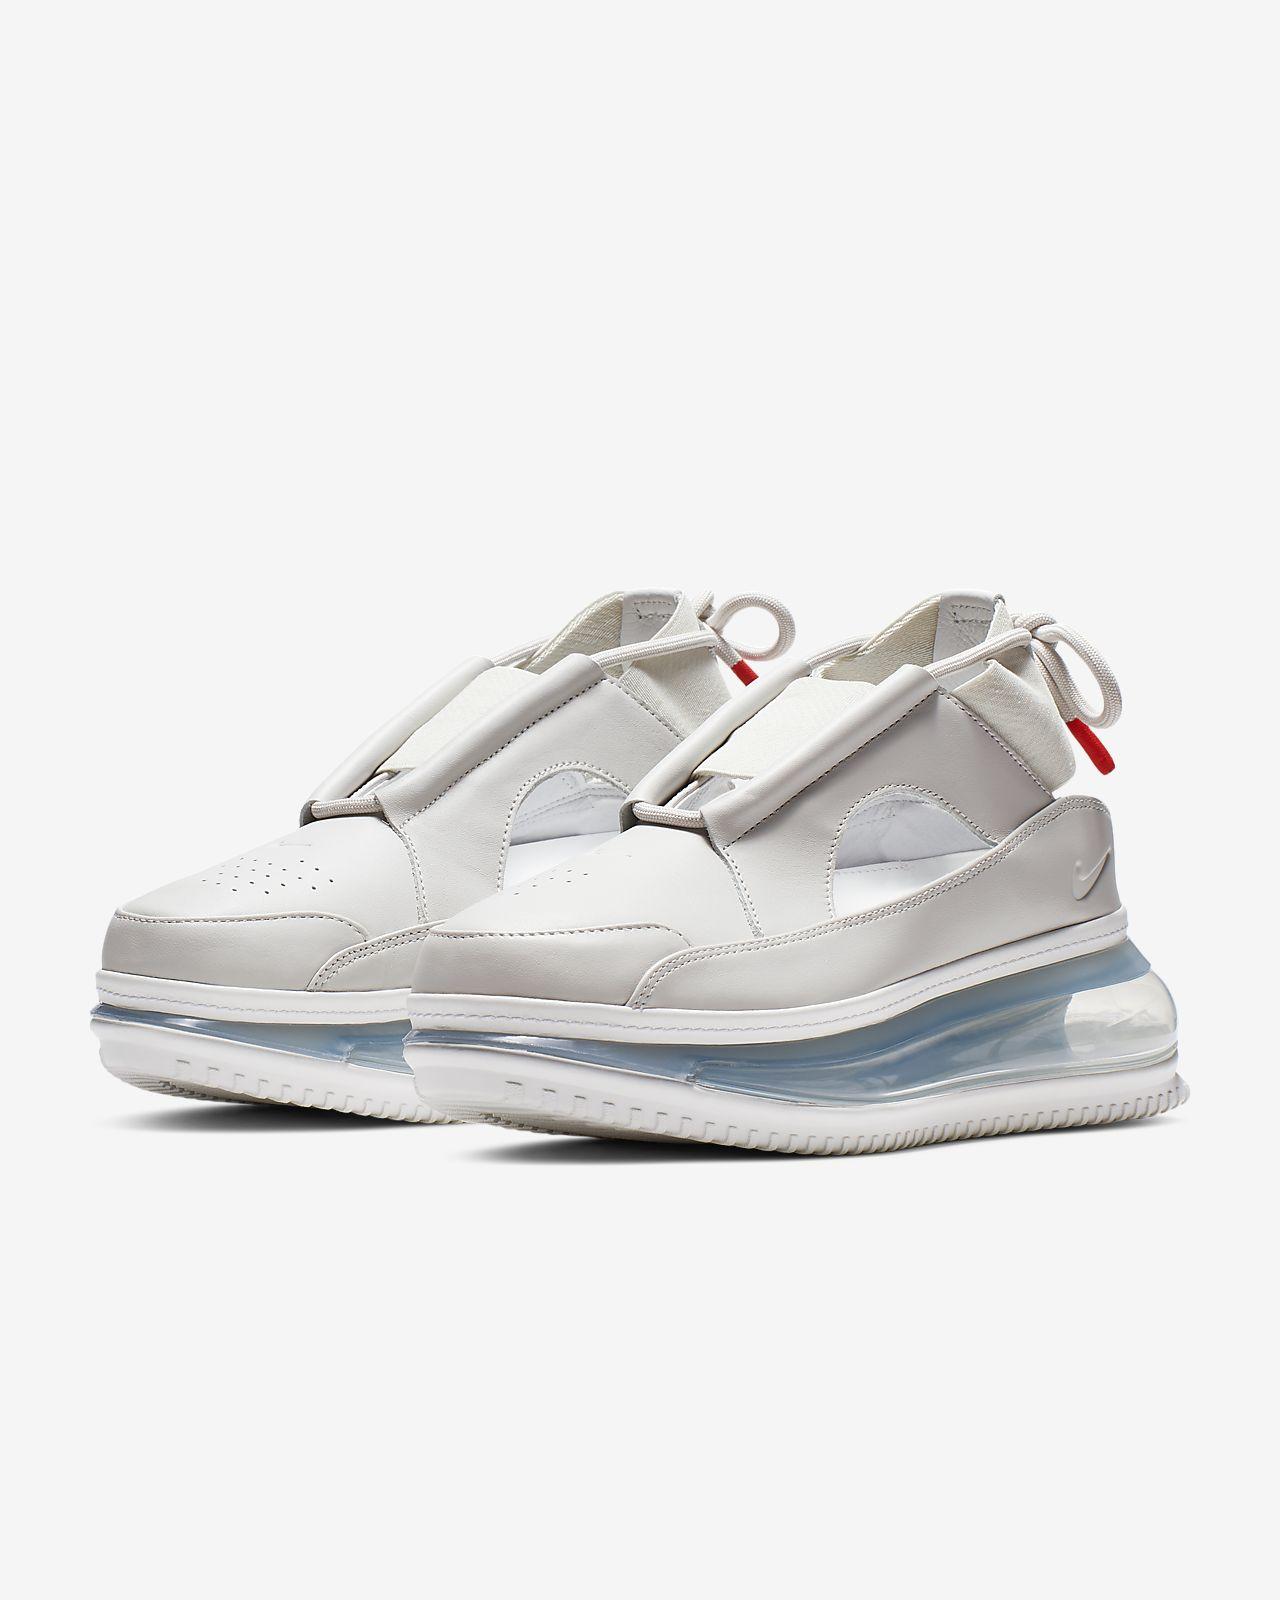 Max 720 Chaussure Air Pour Femme Nike Ff qSUGzVMp